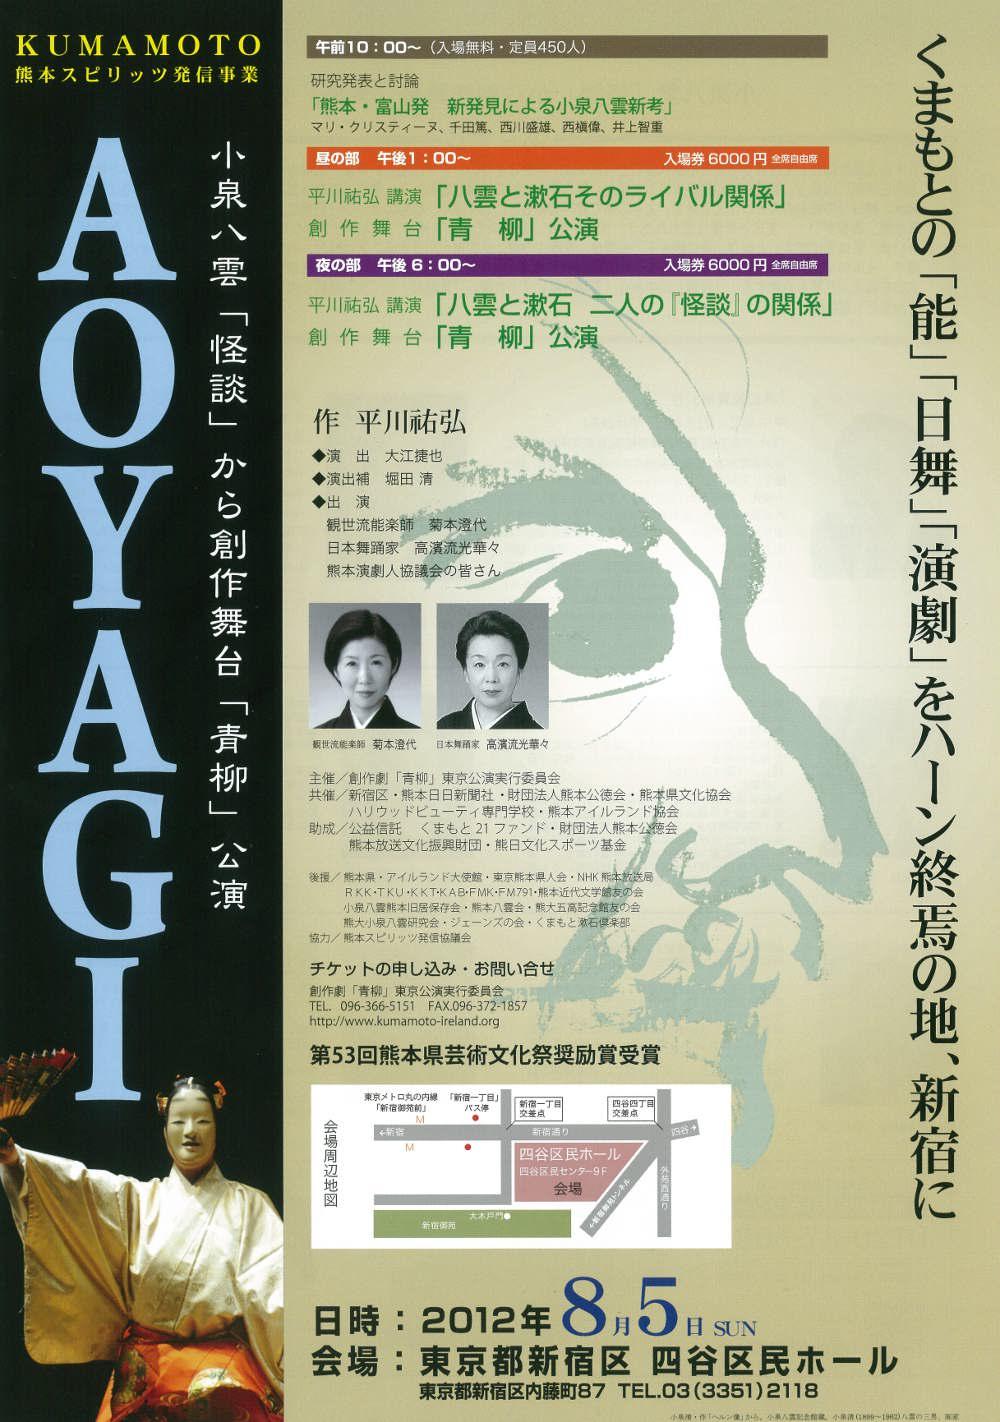 創作舞台「青柳」東京公演チラシ